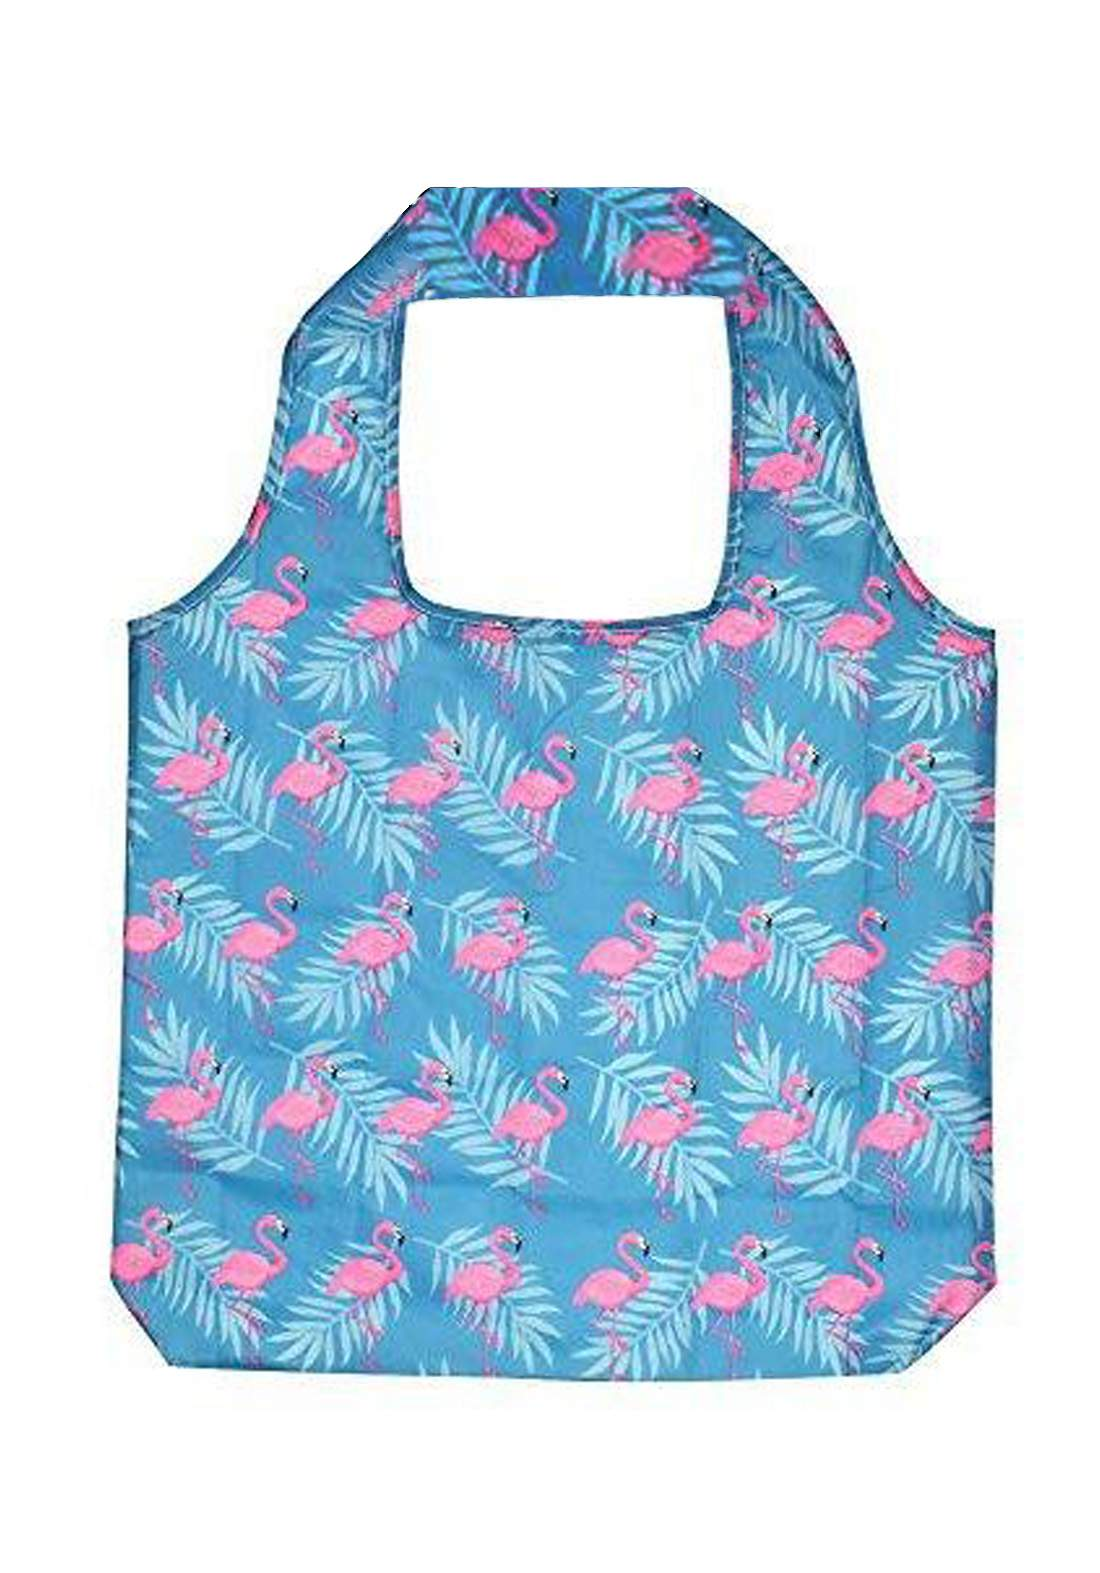 Pearl Metal Martine Eco Bag حقيبة متعددة الأستخدام